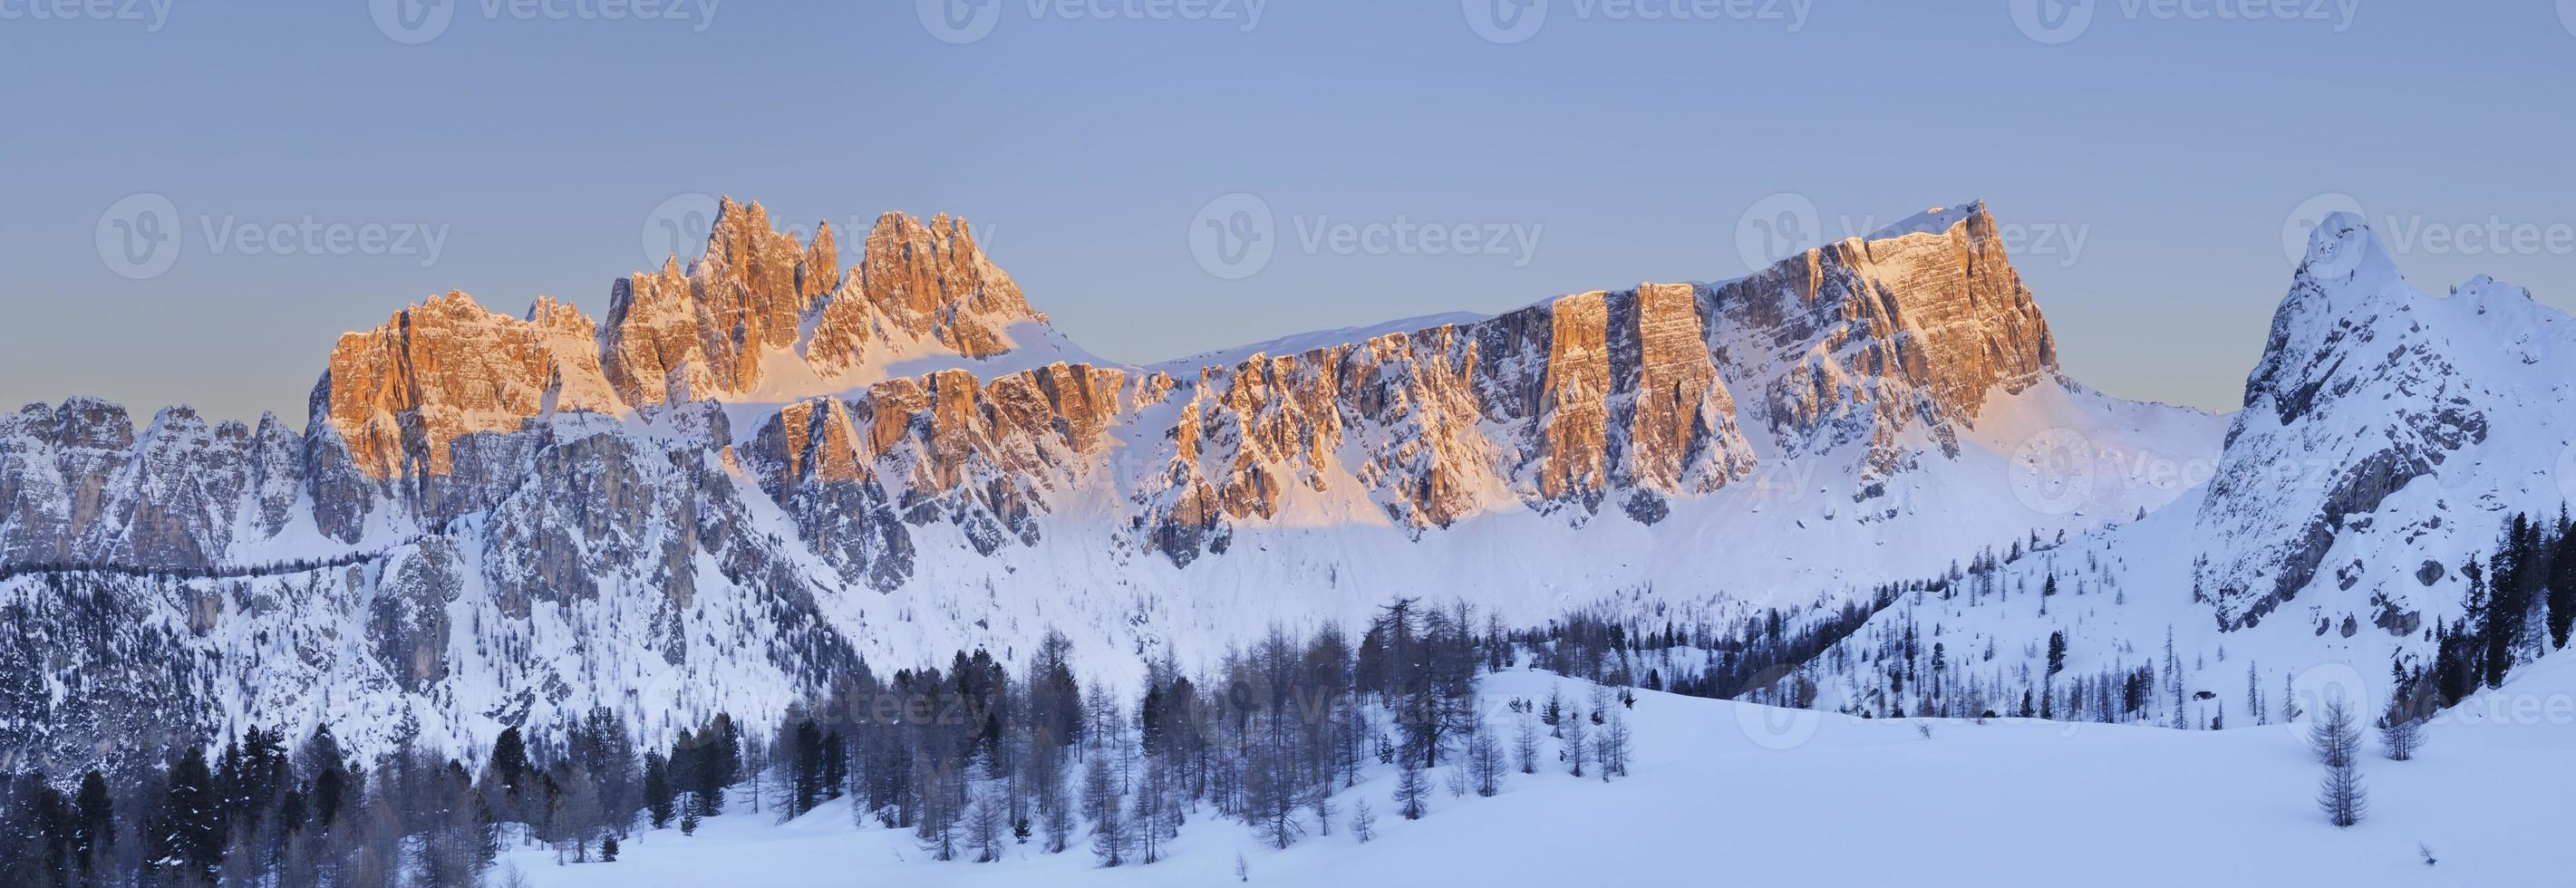 Croda Da Lago at Sunset (Dolomites - Italy) photo